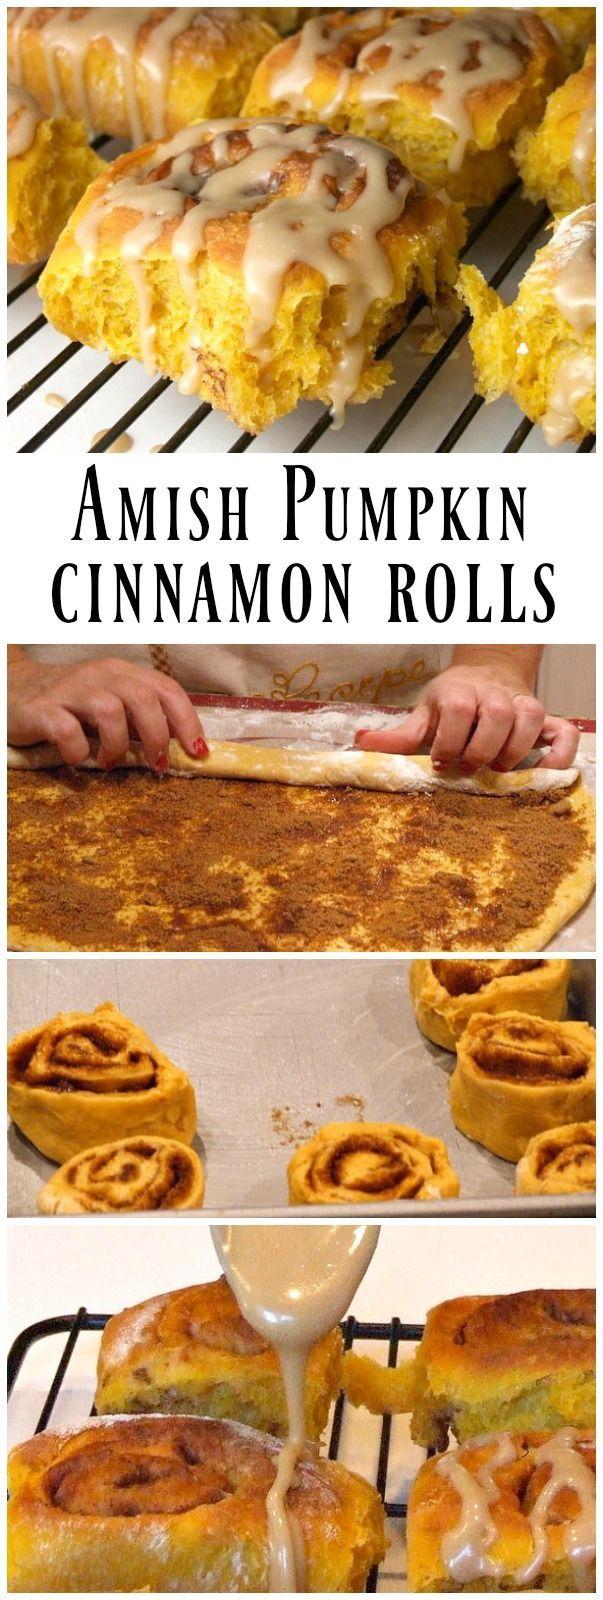 Amish Pumpkin Cinnamon Rolls - recipe from RecipeGirl.com (cinnabon icing recipe)